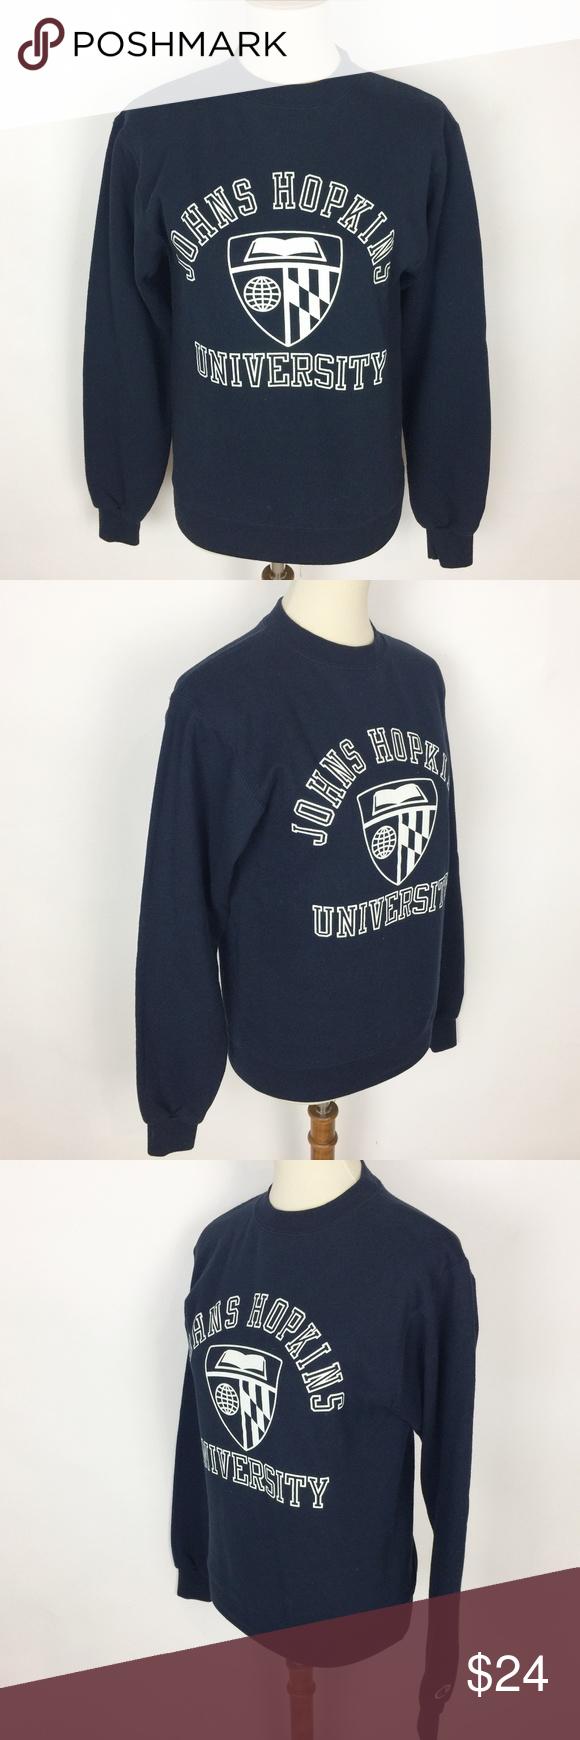 Johns Hopkins University Crewneck Sweatshirt Crew Neck Sweatshirt Sweatshirts Sweatshirt Tops [ 1740 x 580 Pixel ]